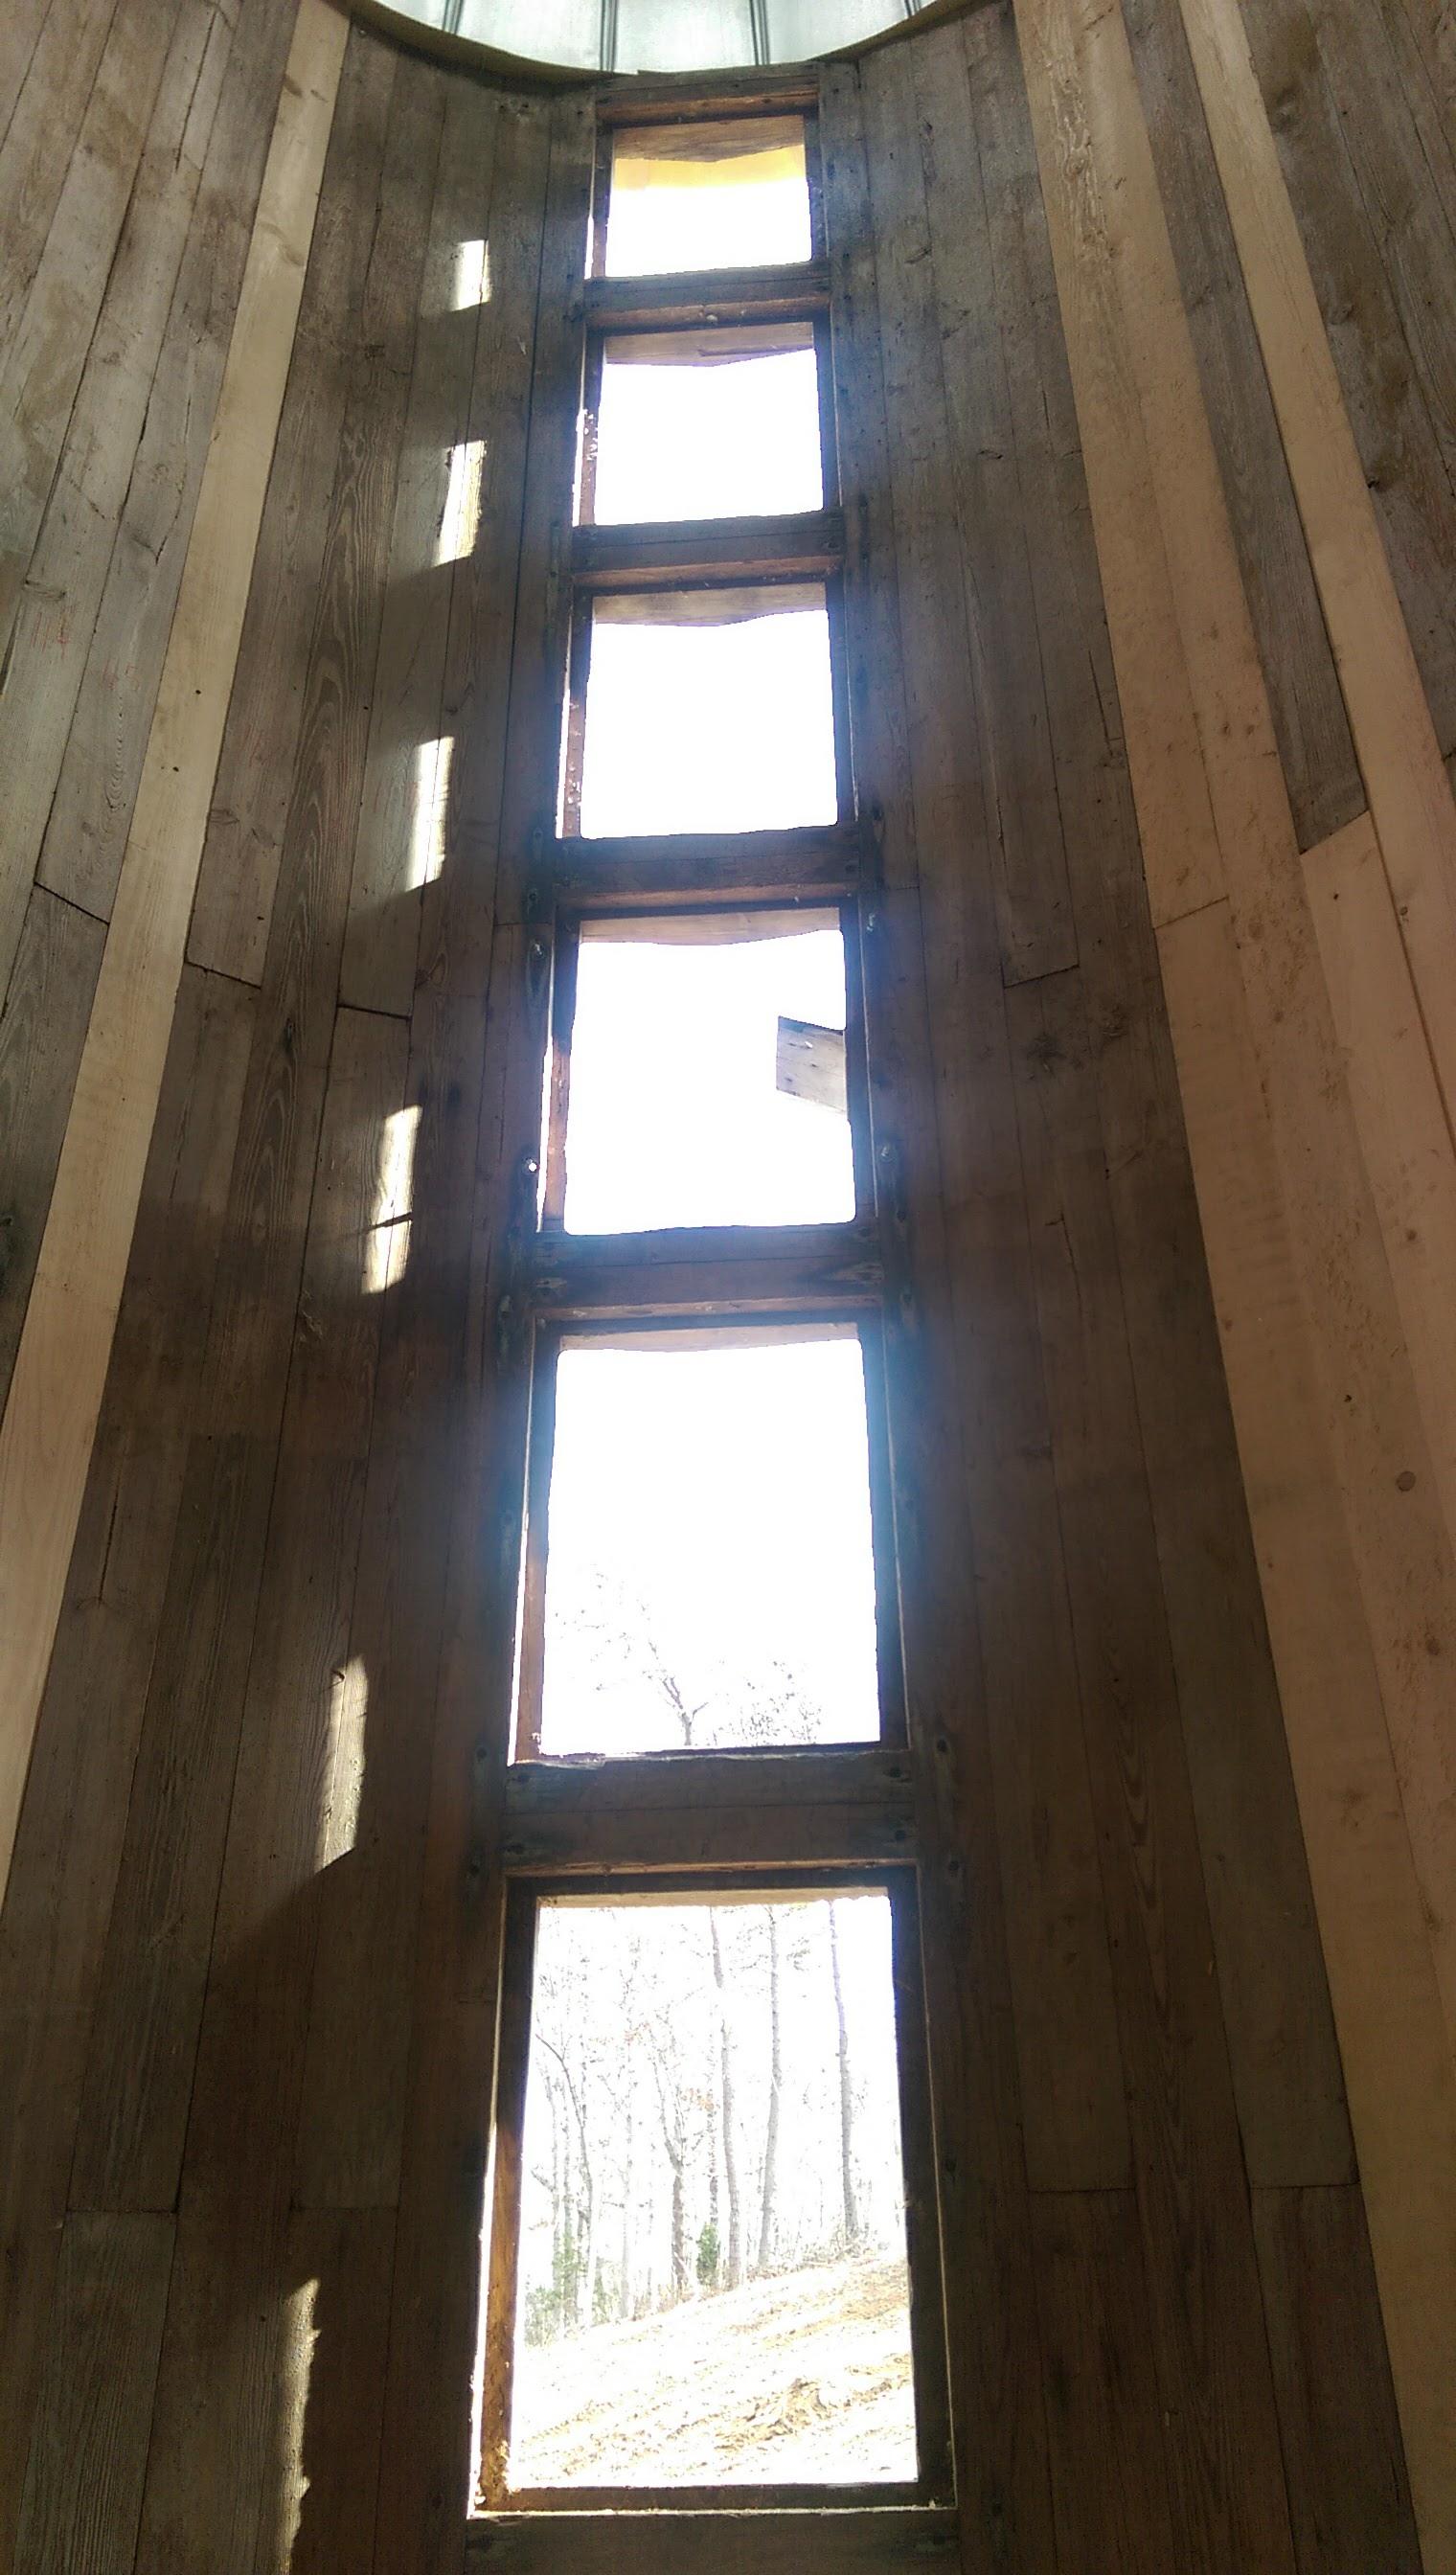 Inside the silo